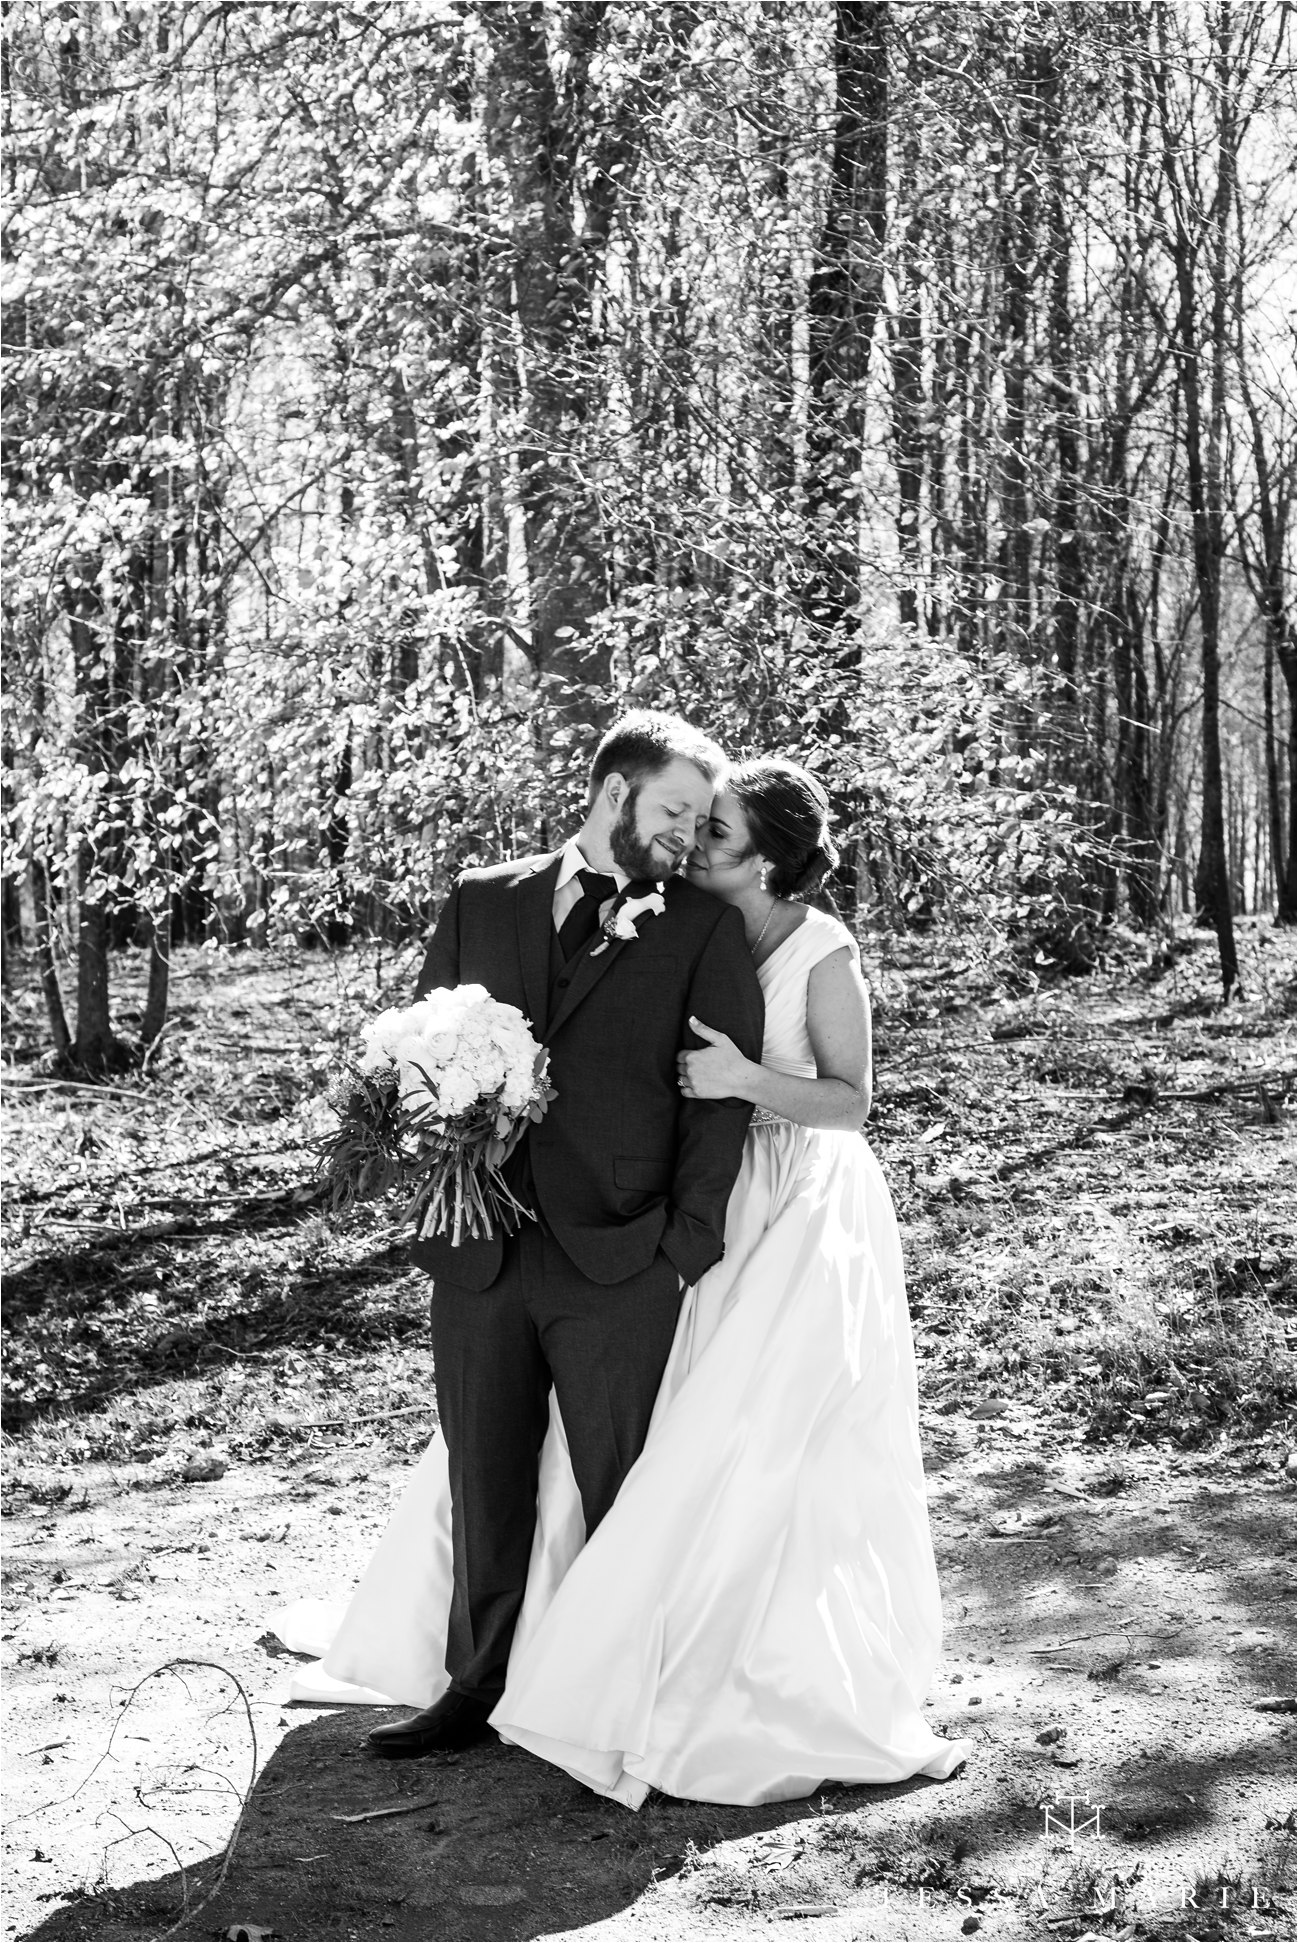 tessa_marie_weddings_wedding_moments_Tessa_marie_studios_0056